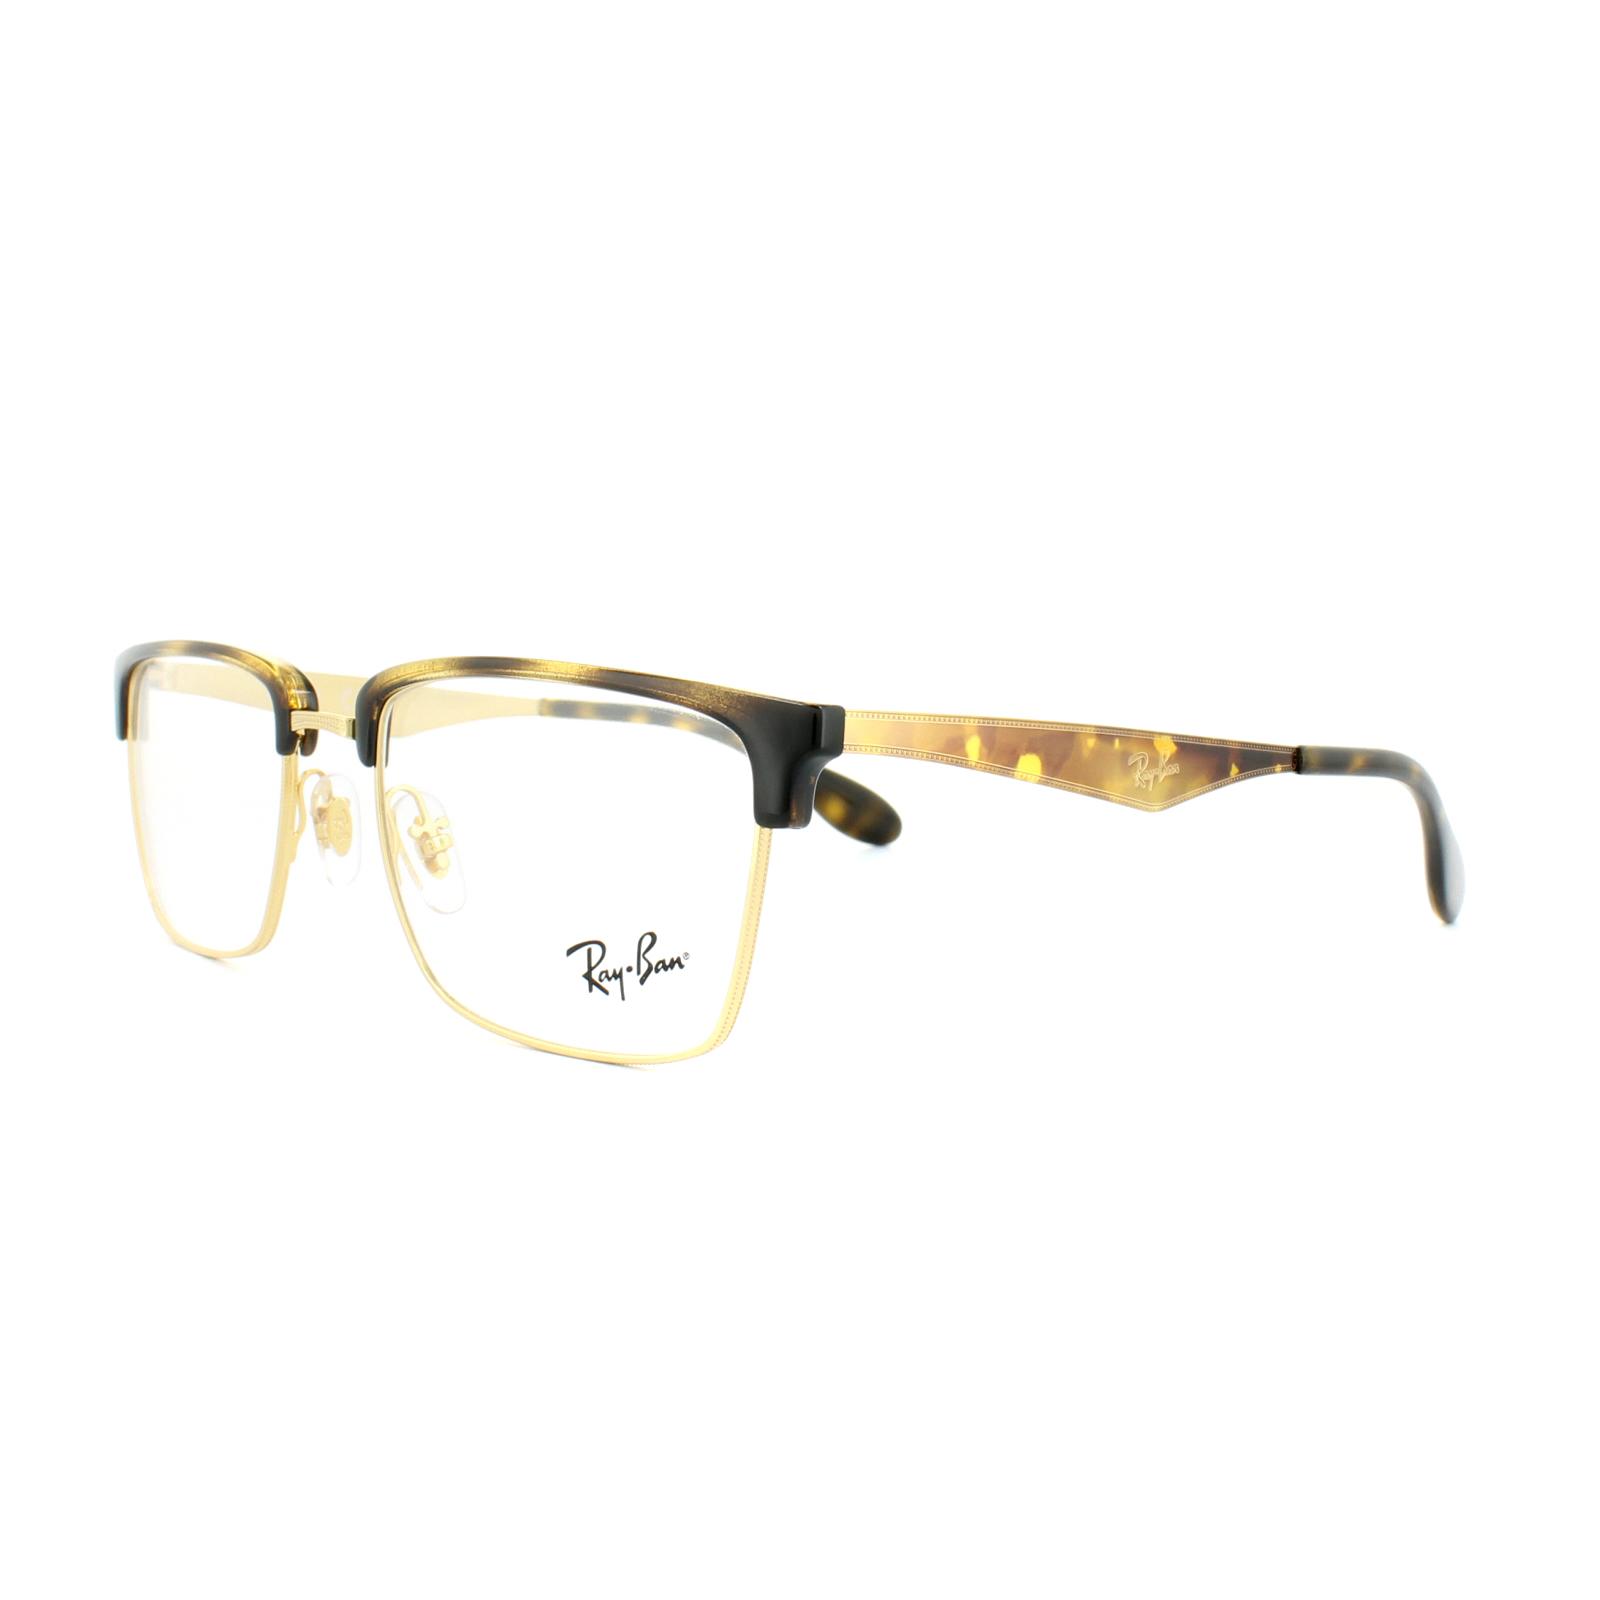 8d8fb9a80b4 Sentinel Ray-Ban Glasses Frames RX 6397 2933 Gold Havana Mens Womens 52mm